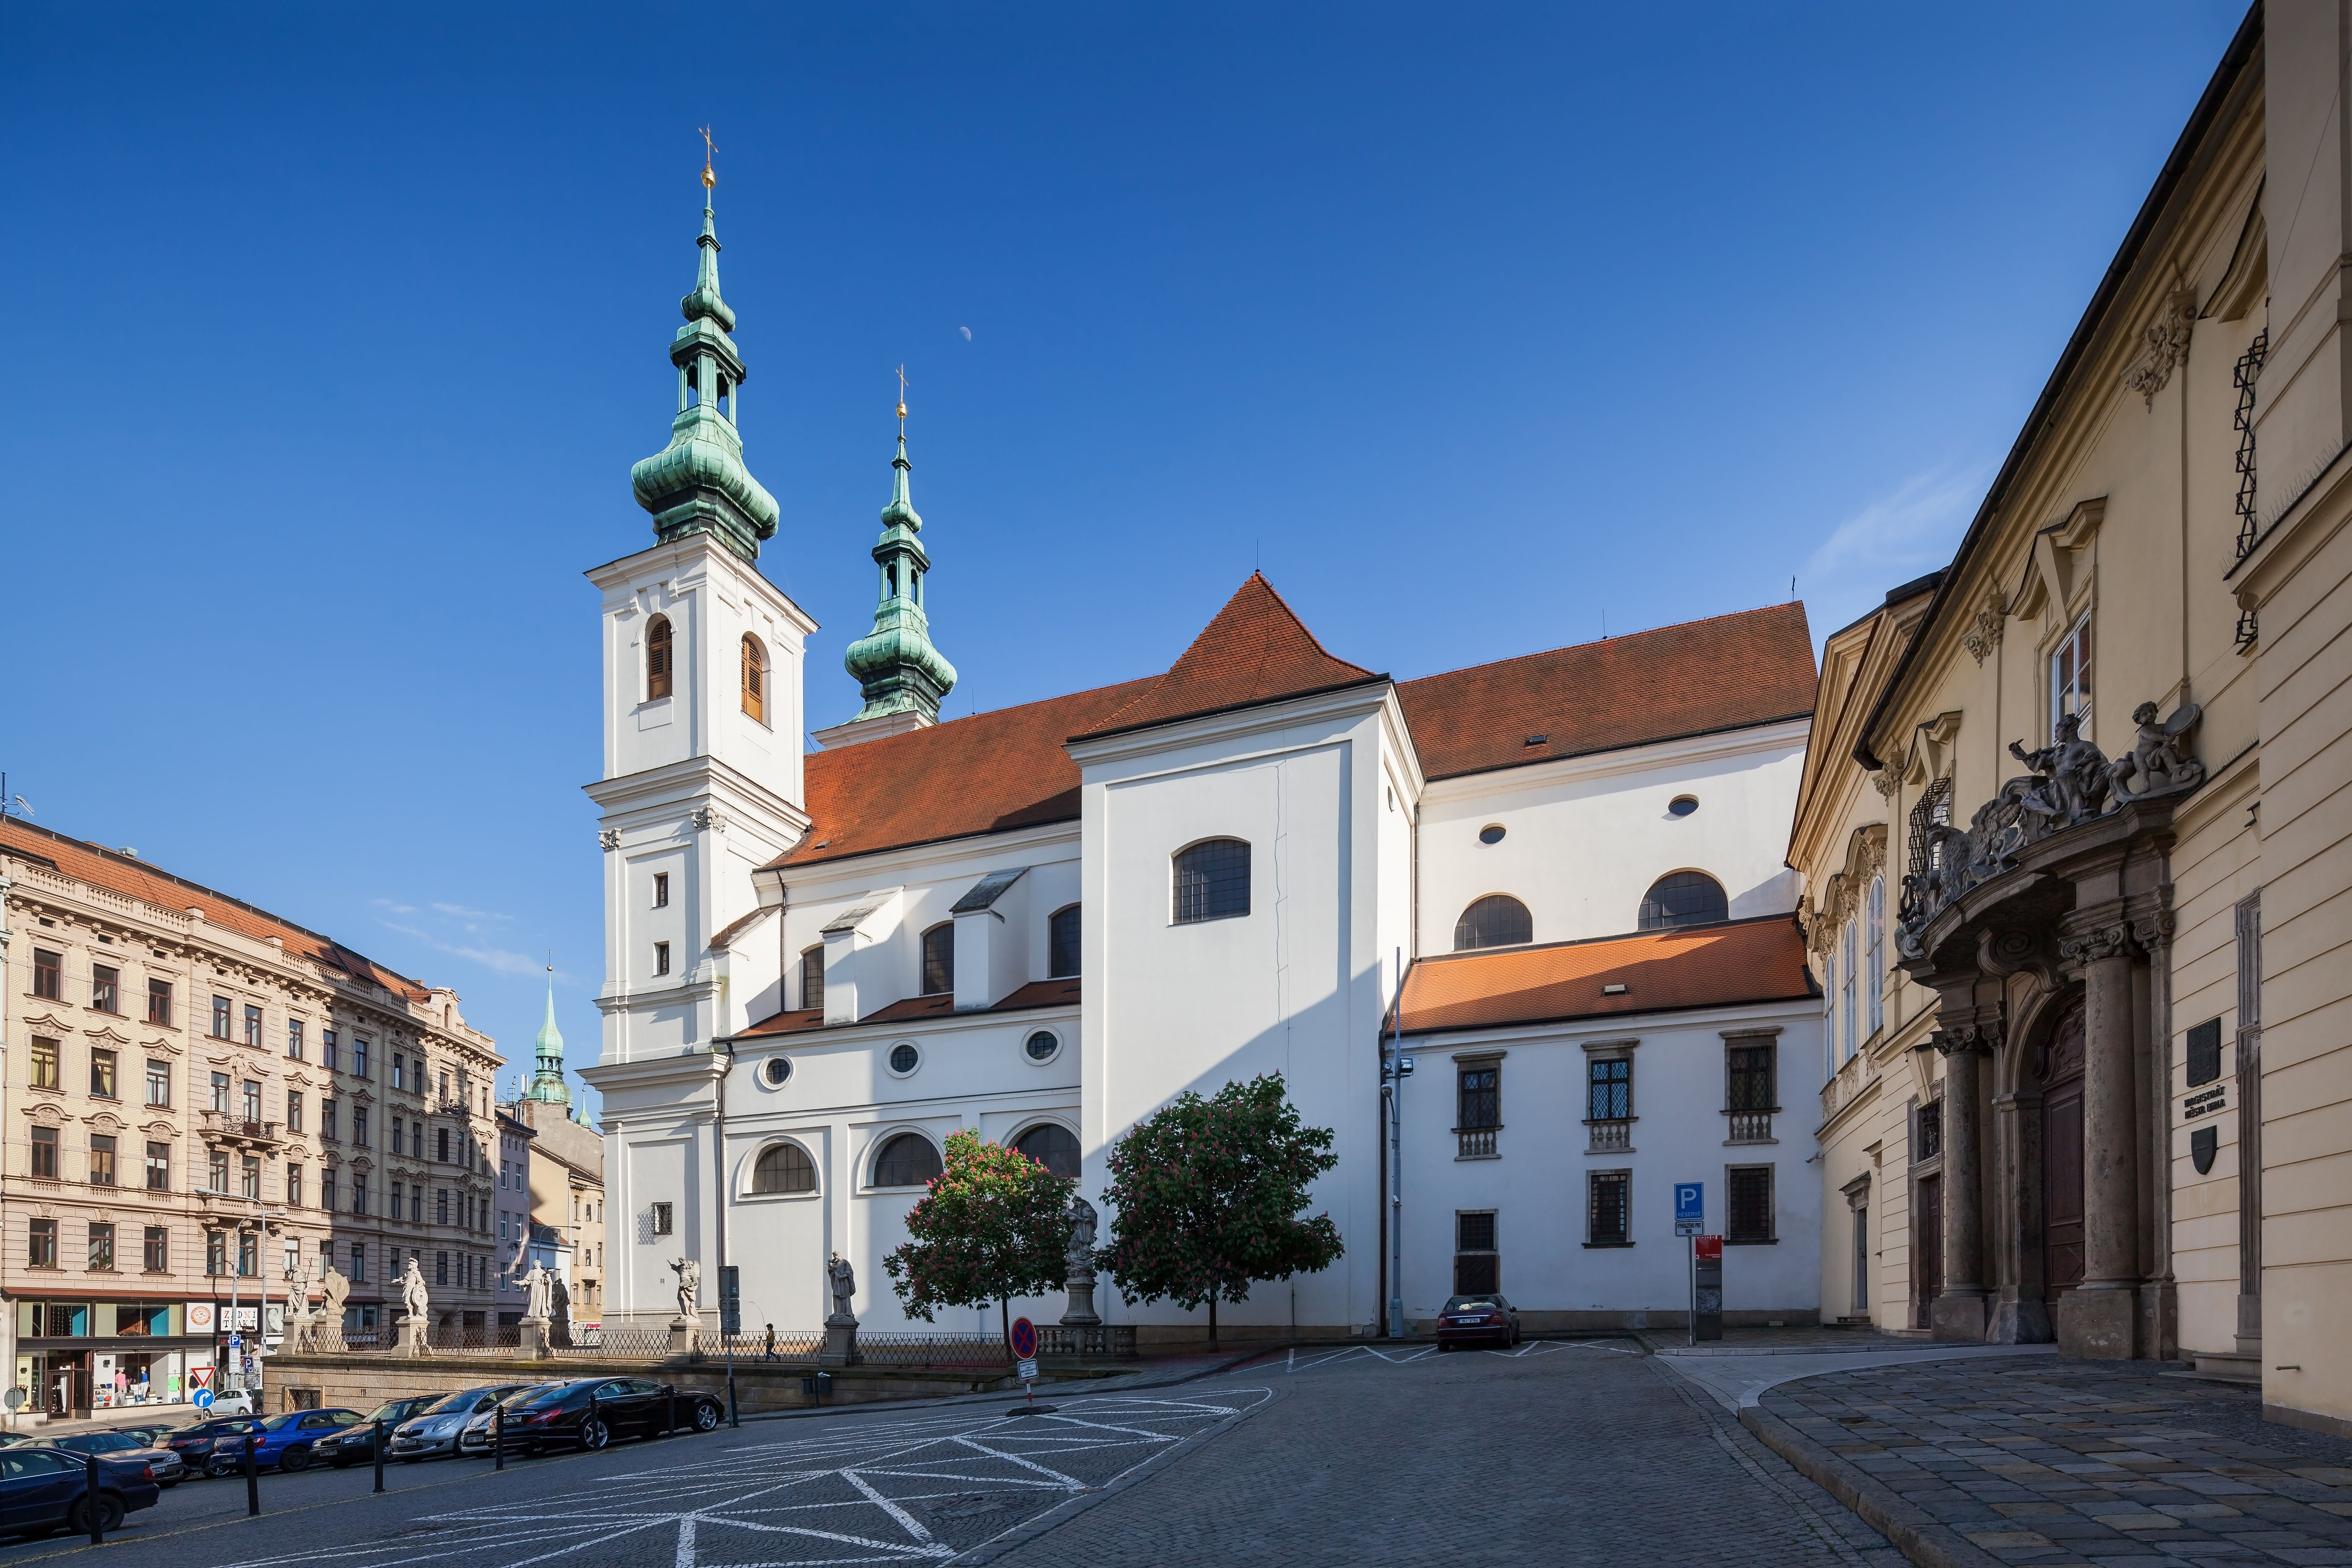 Church of St Michael (Kostel sv. Michala) in Brno